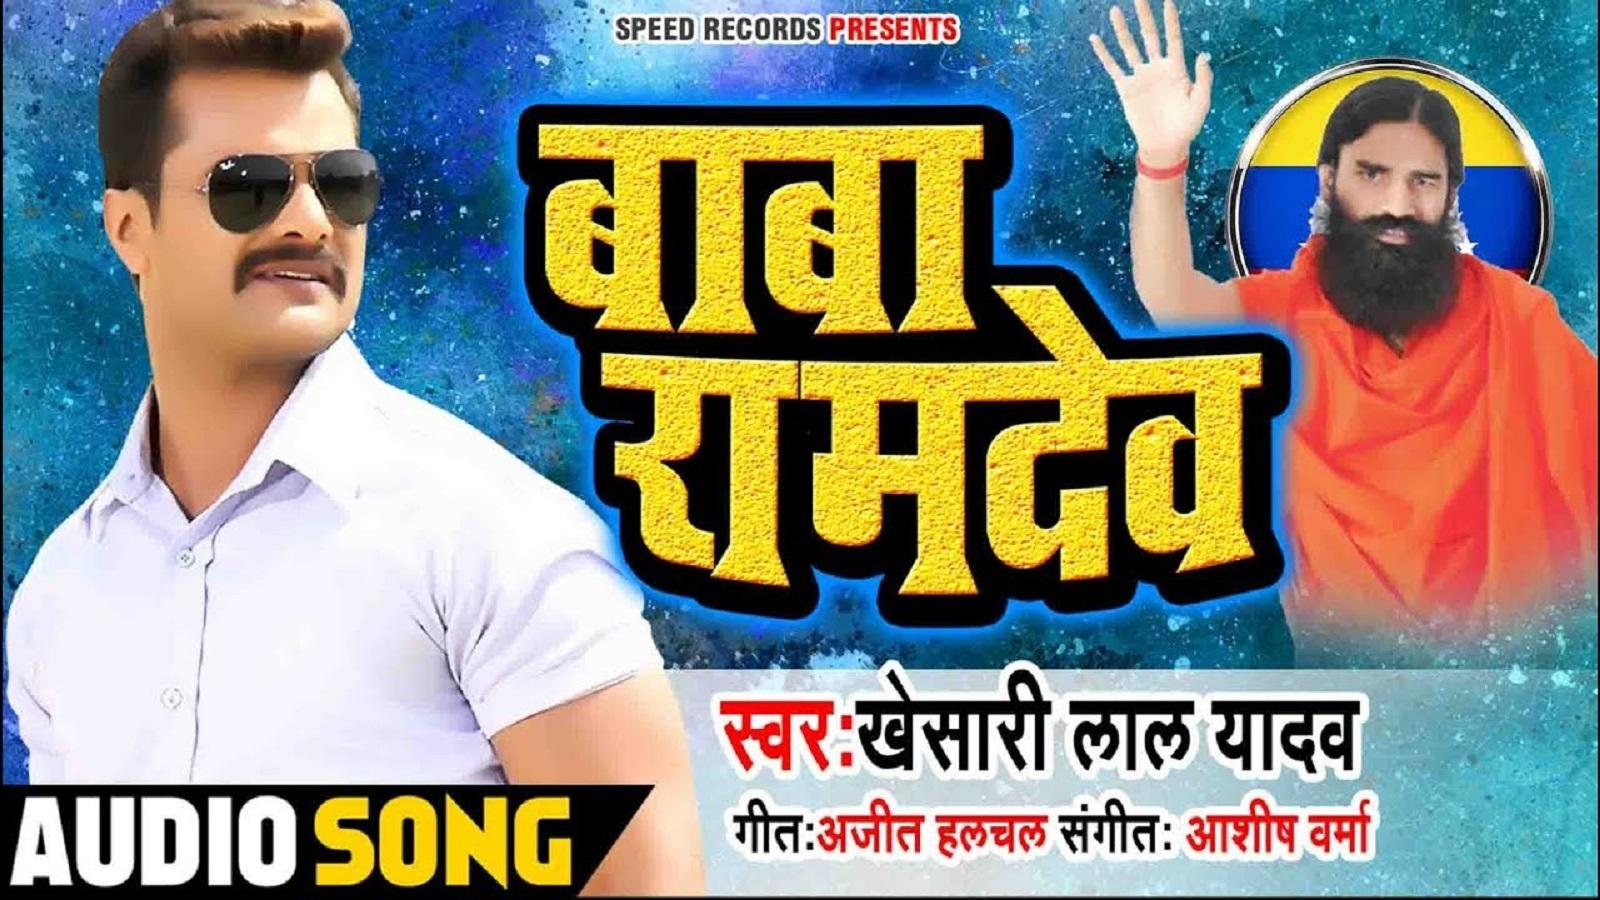 Khesari Lal Yadav Ka Naya Bhojpuri Gana MP3 Song Download: Latest Bhojpuri  song 'Baba Ramdev' sung by Khesari Lal Yadav